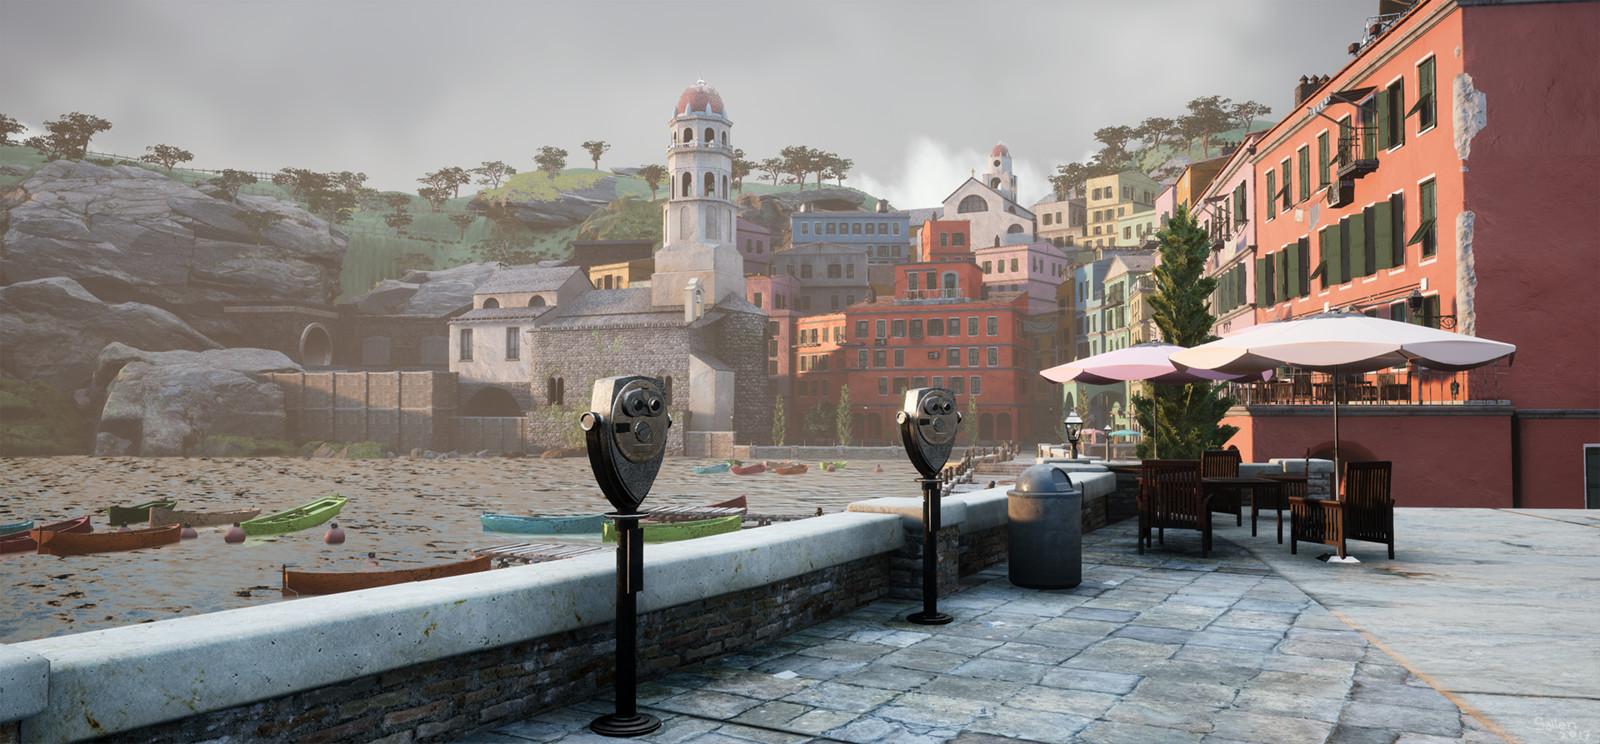 Cinque Terre, Italy - Vernazza Project UE4/VR WIP